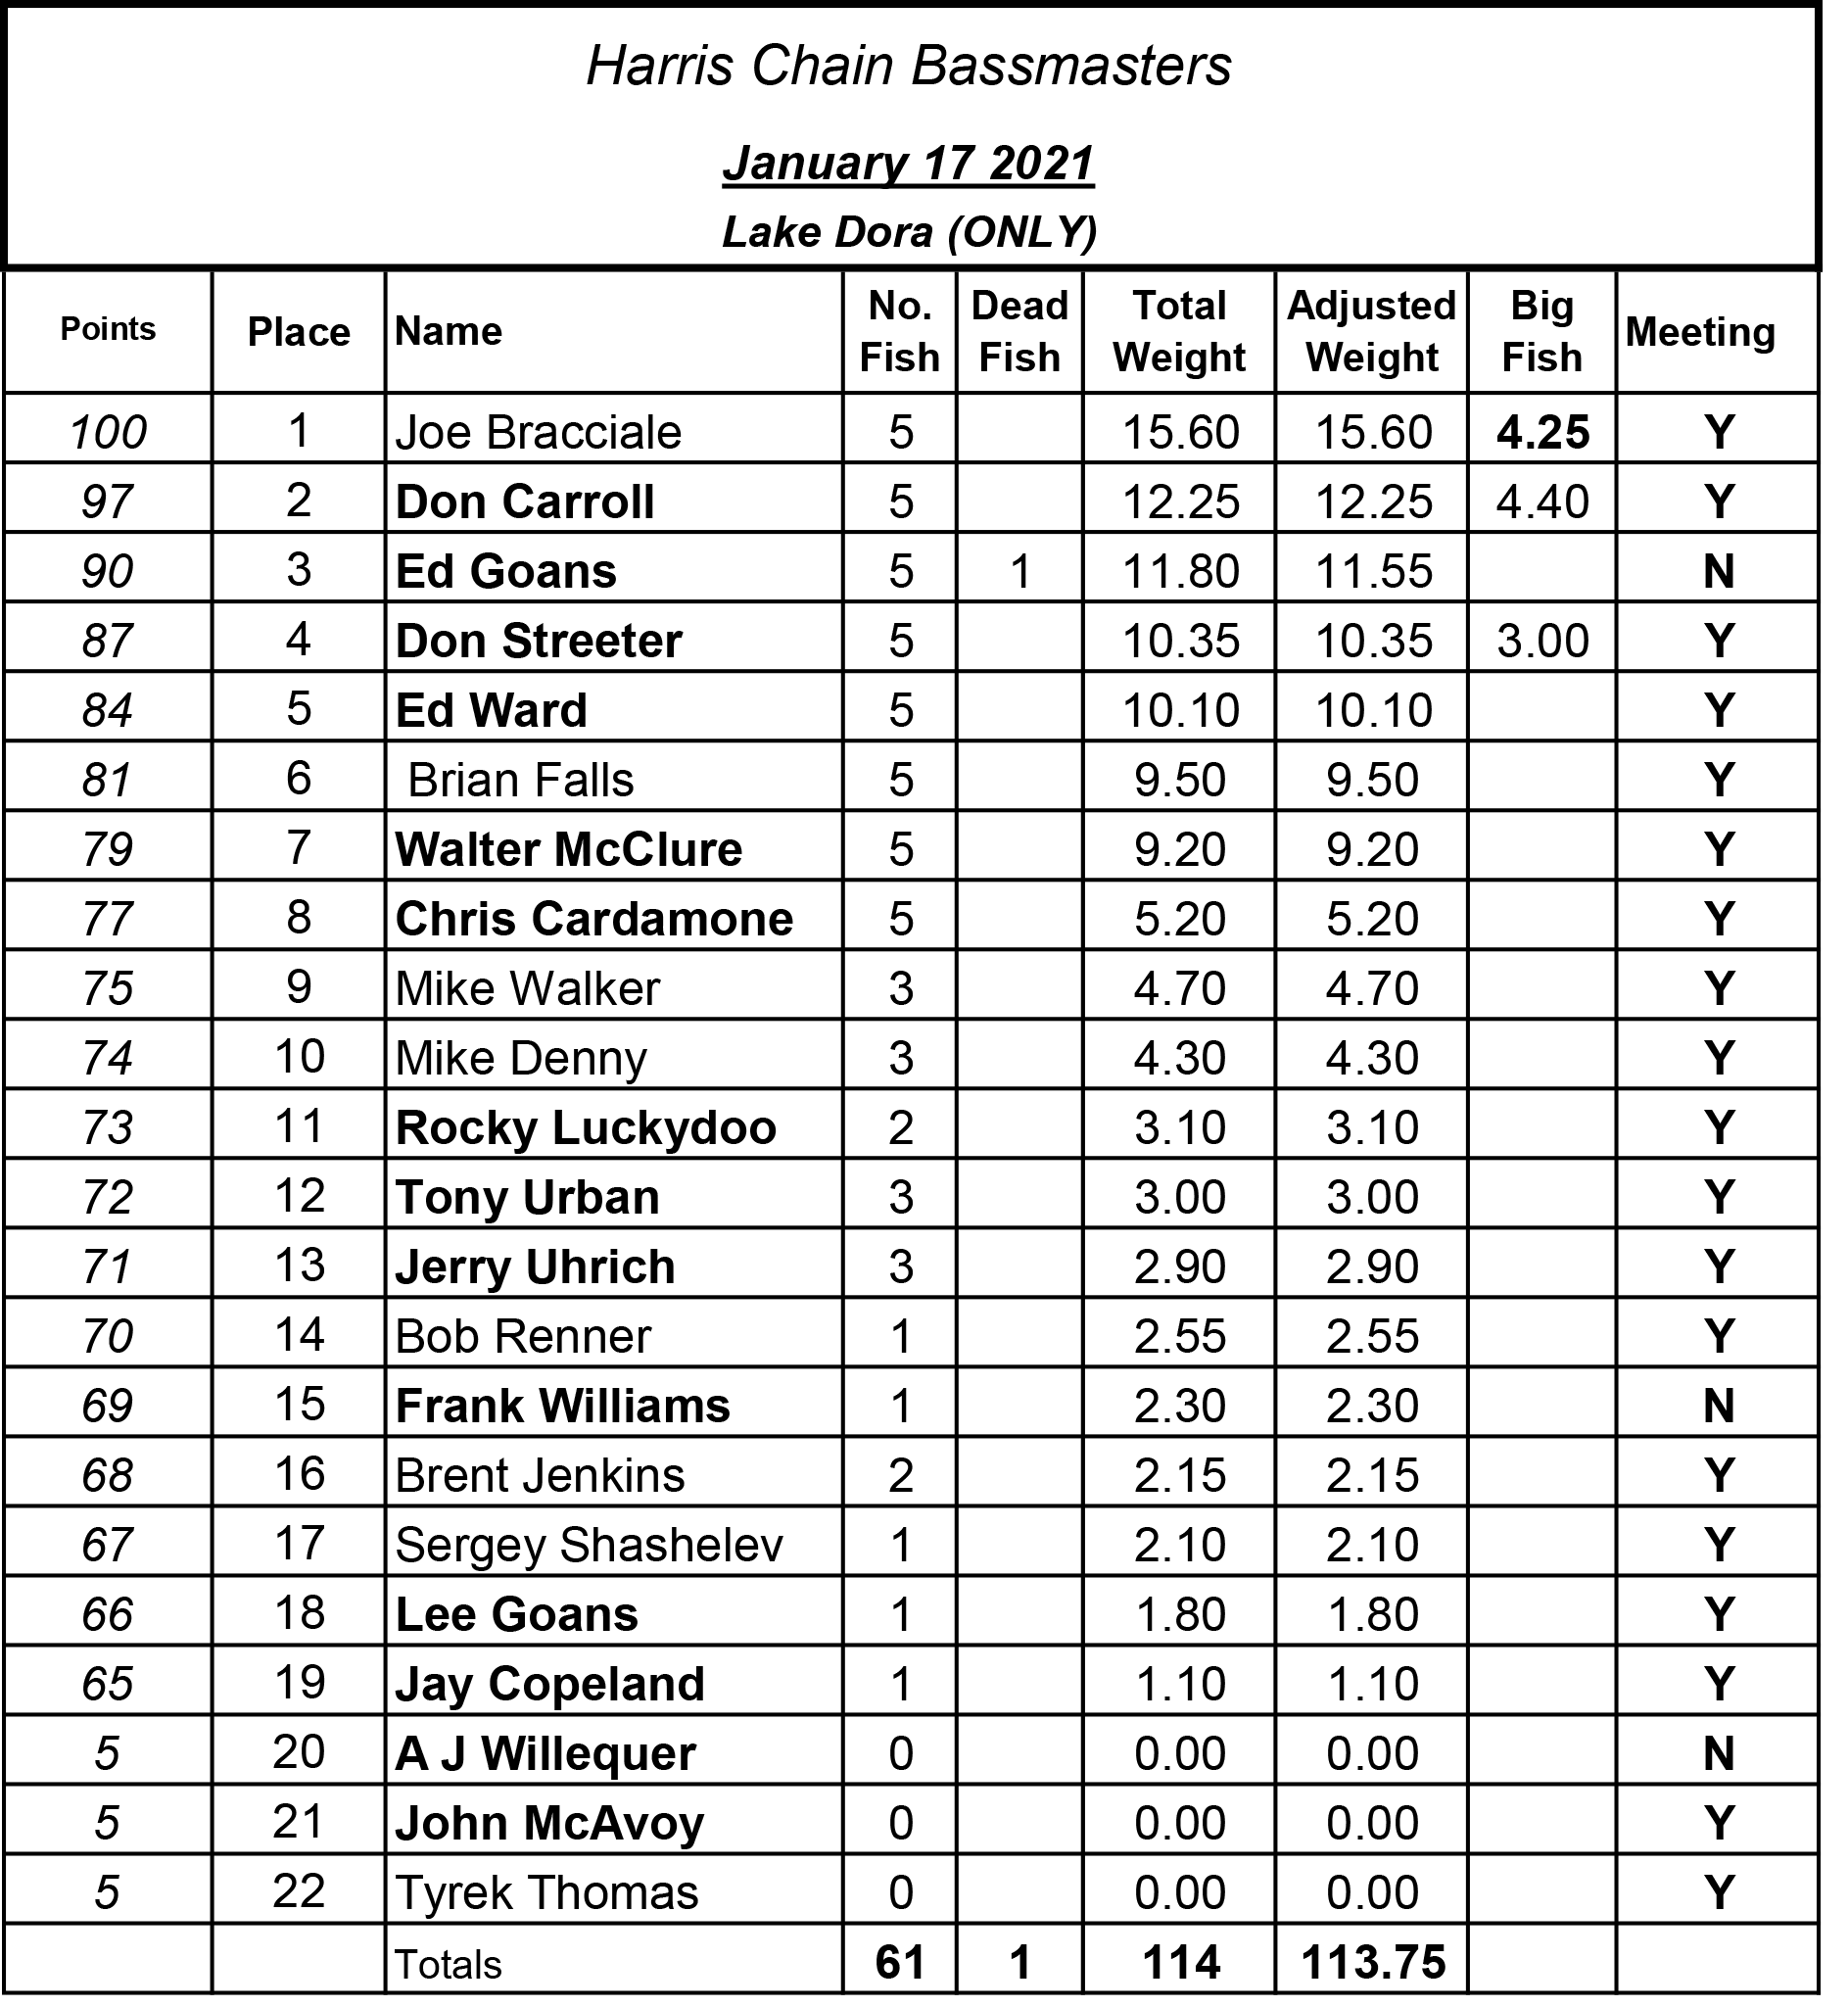 01Dora21